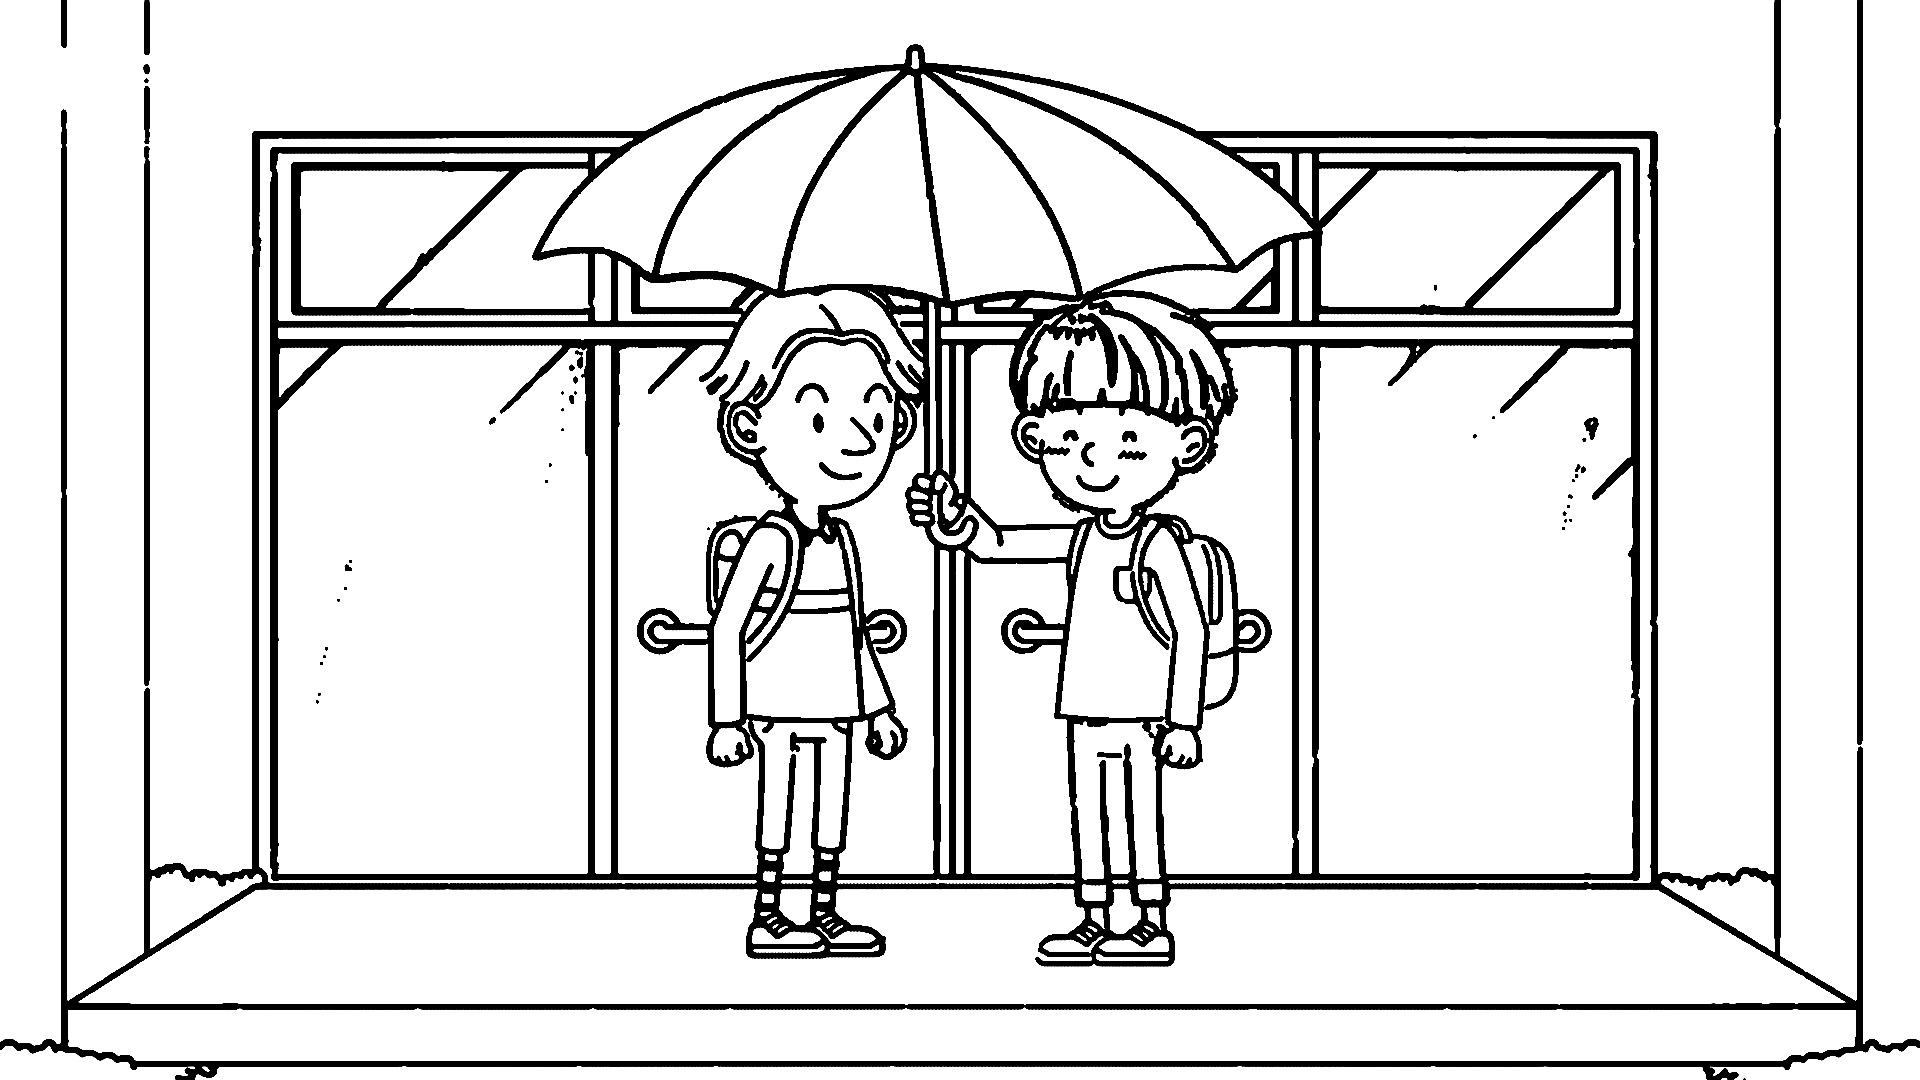 Speaking Cartoon Kids Coloring Page 32